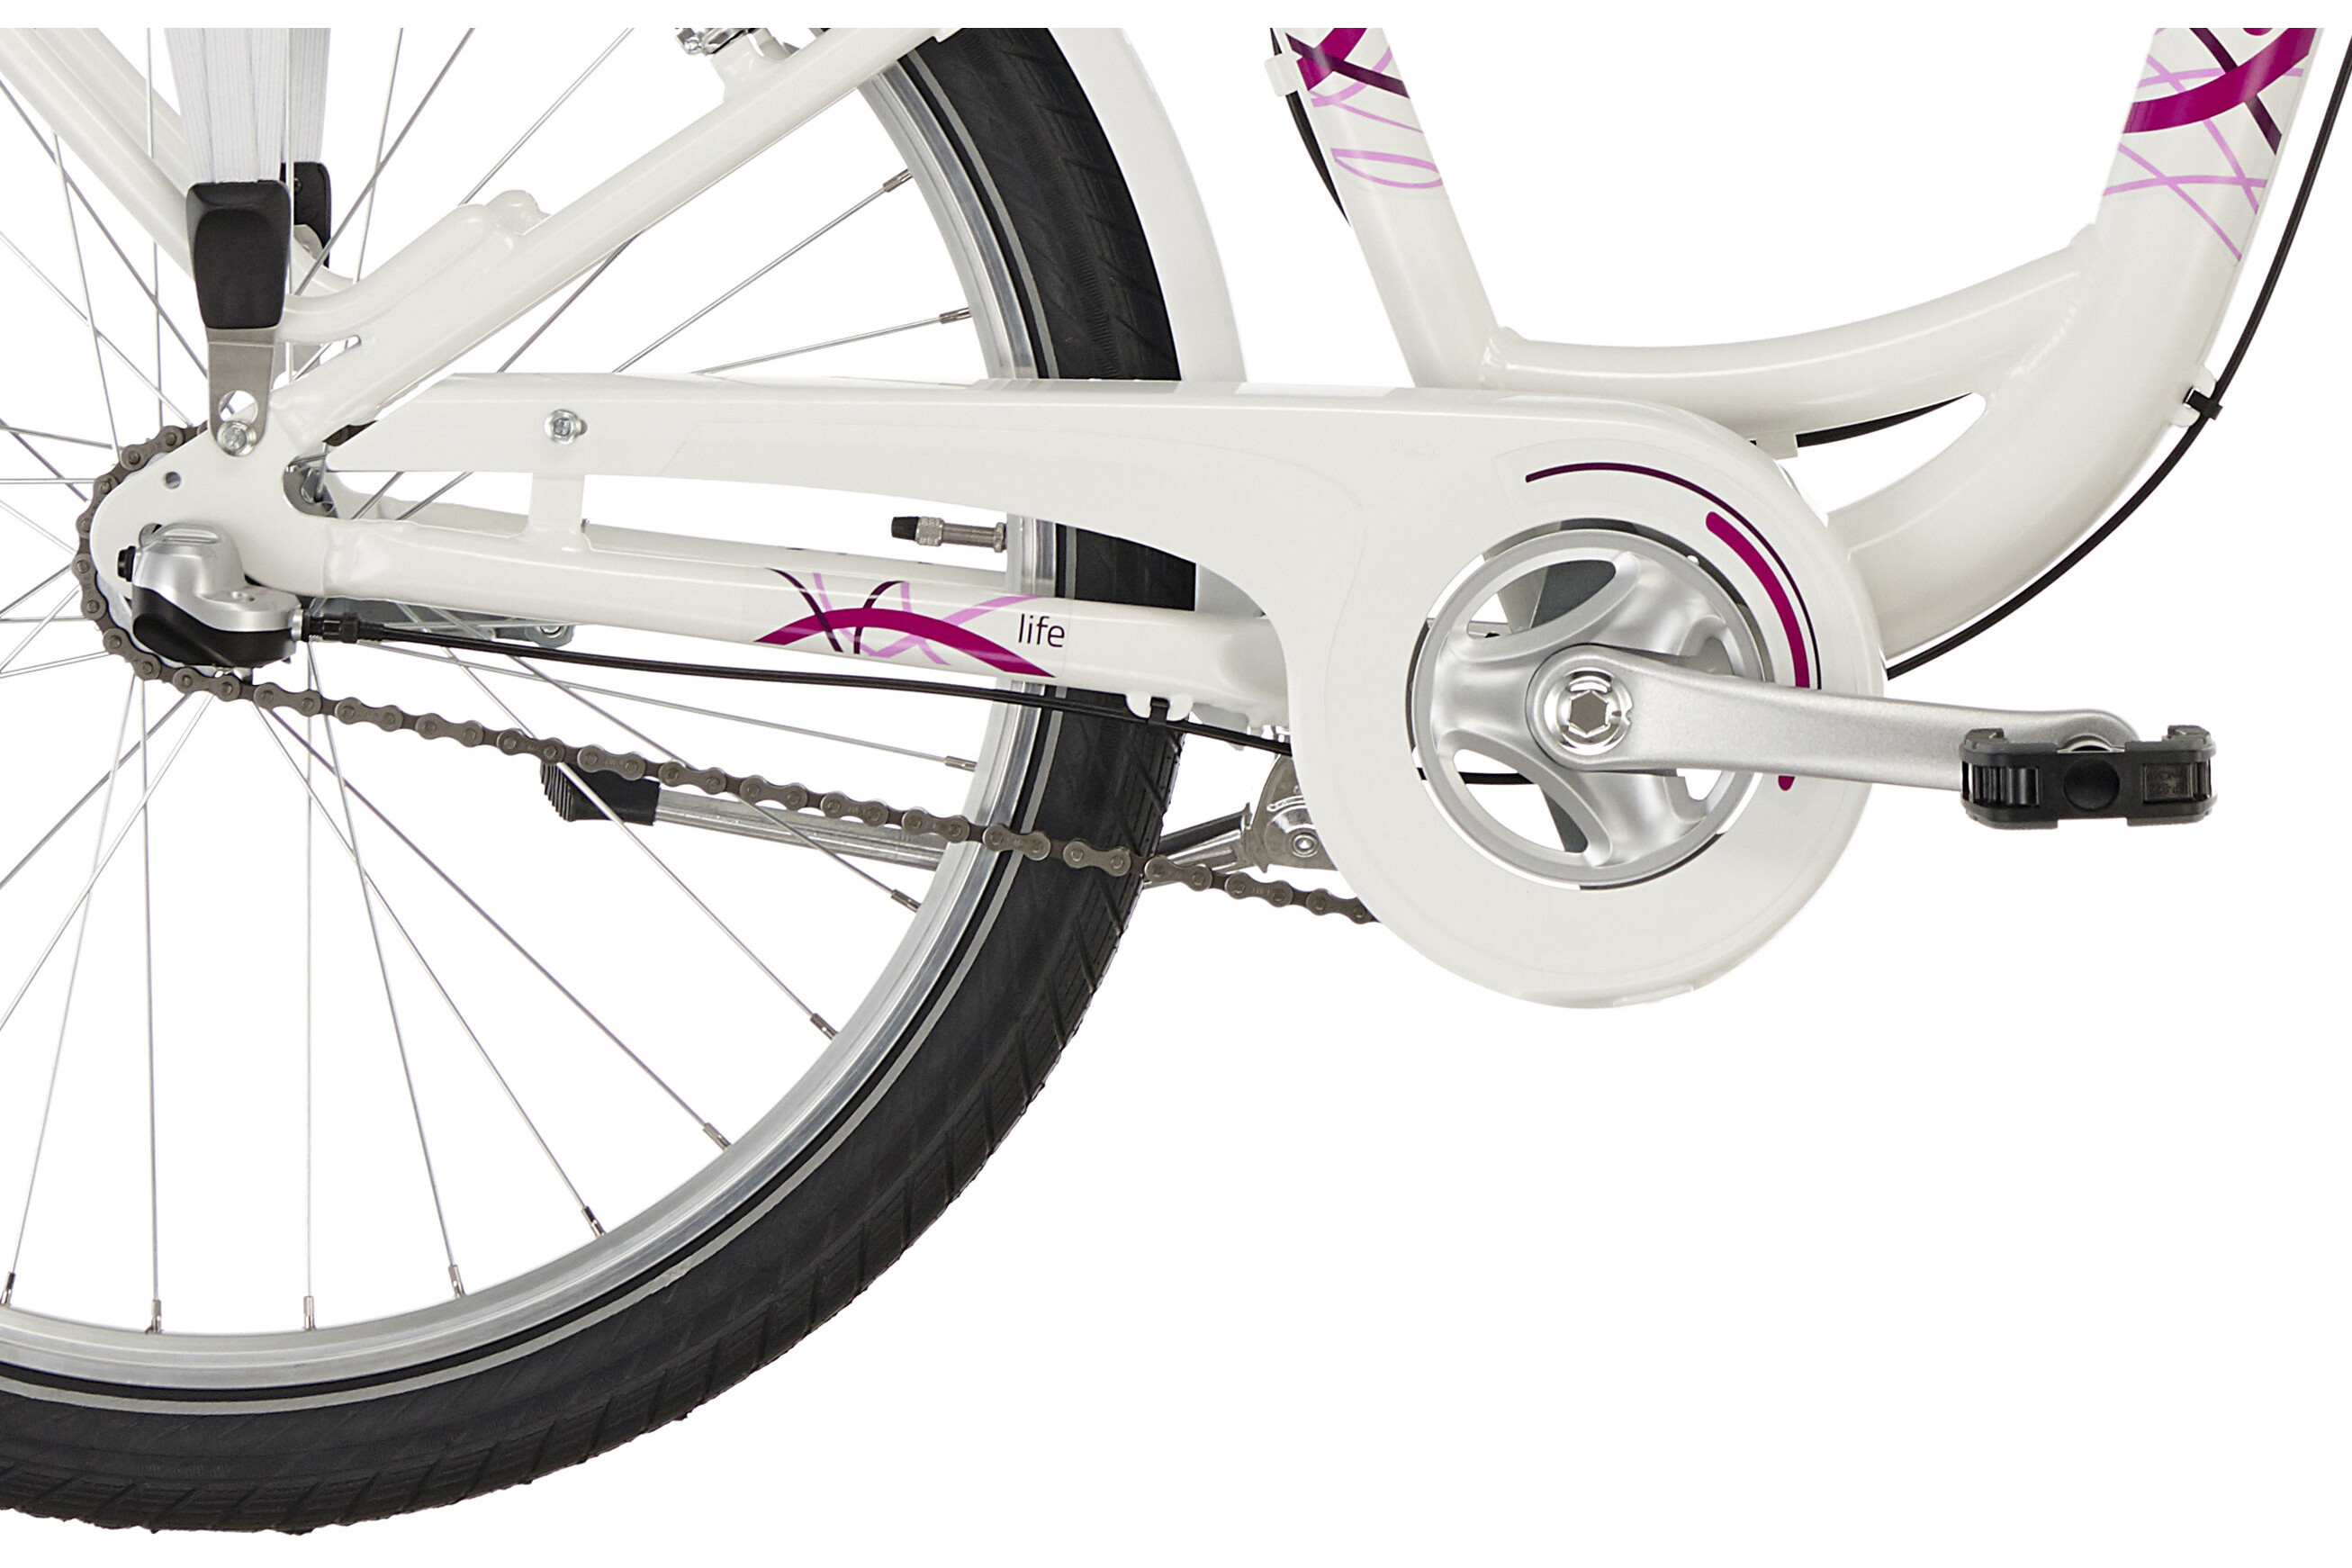 puky skyride light 24 fahrrad 3 gang m dchen wei g nstig kaufen br gelmann. Black Bedroom Furniture Sets. Home Design Ideas